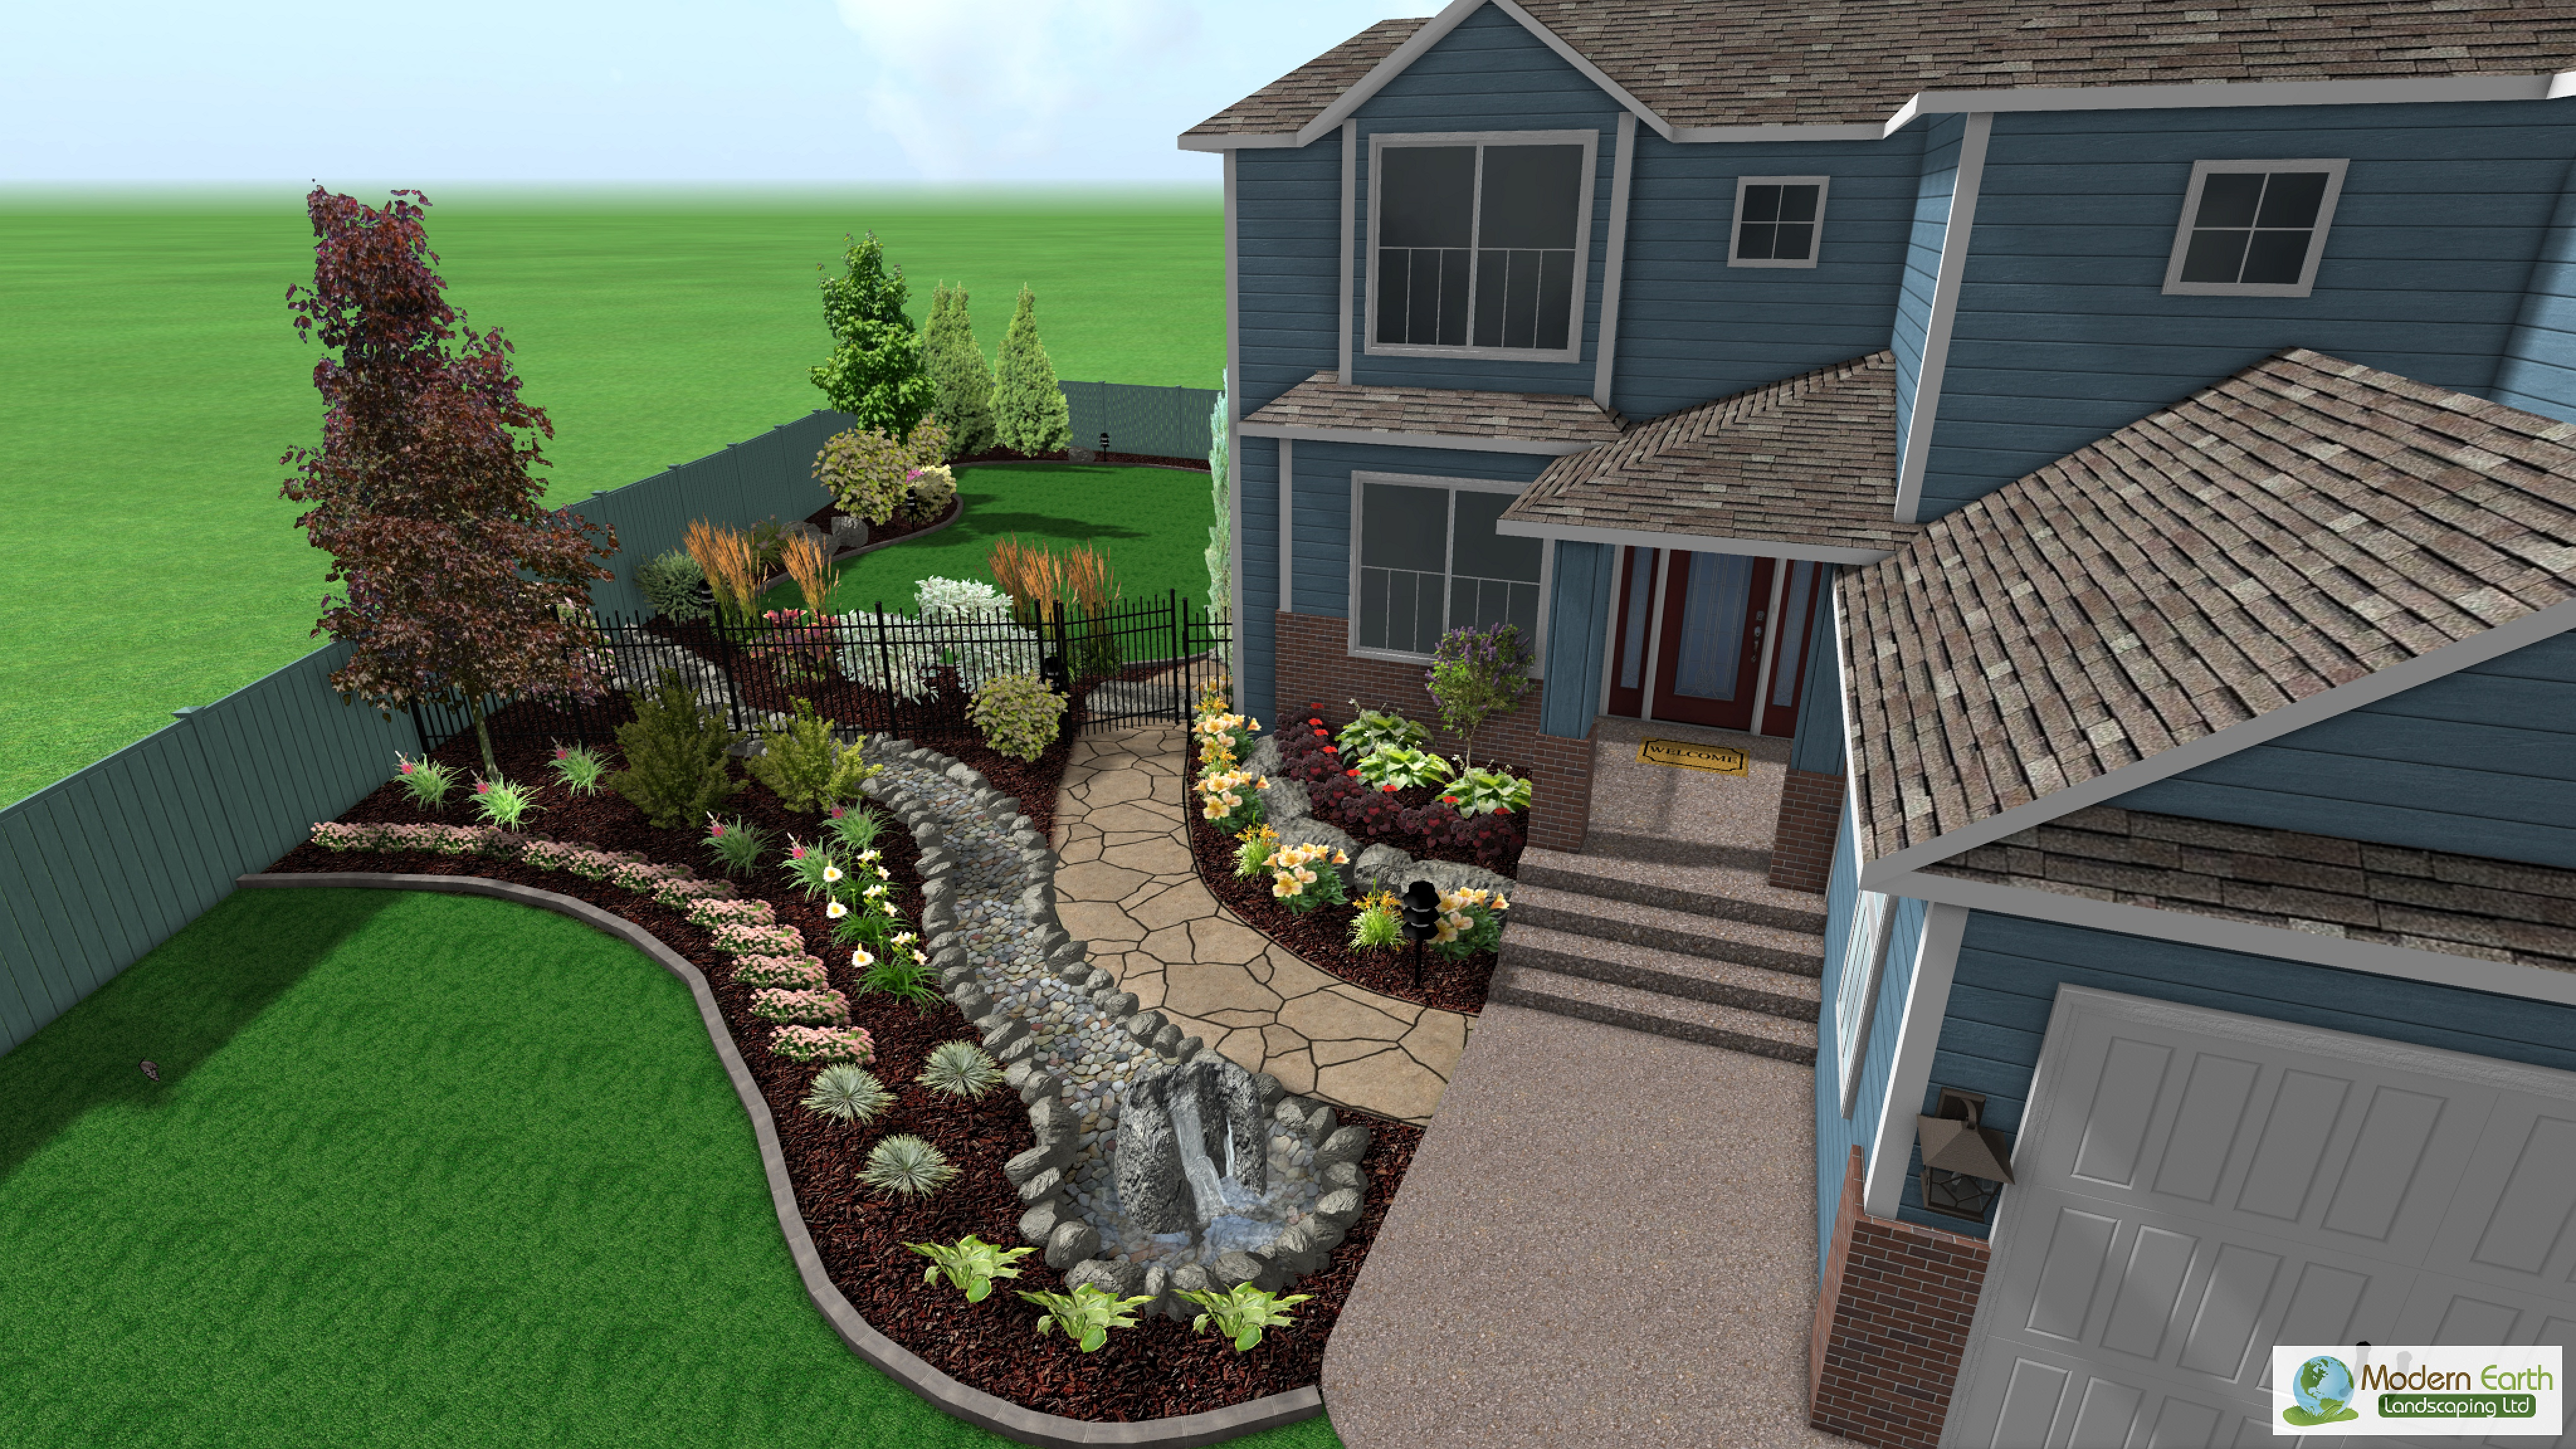 3d landscape design for Home design 3d outdoor garden full